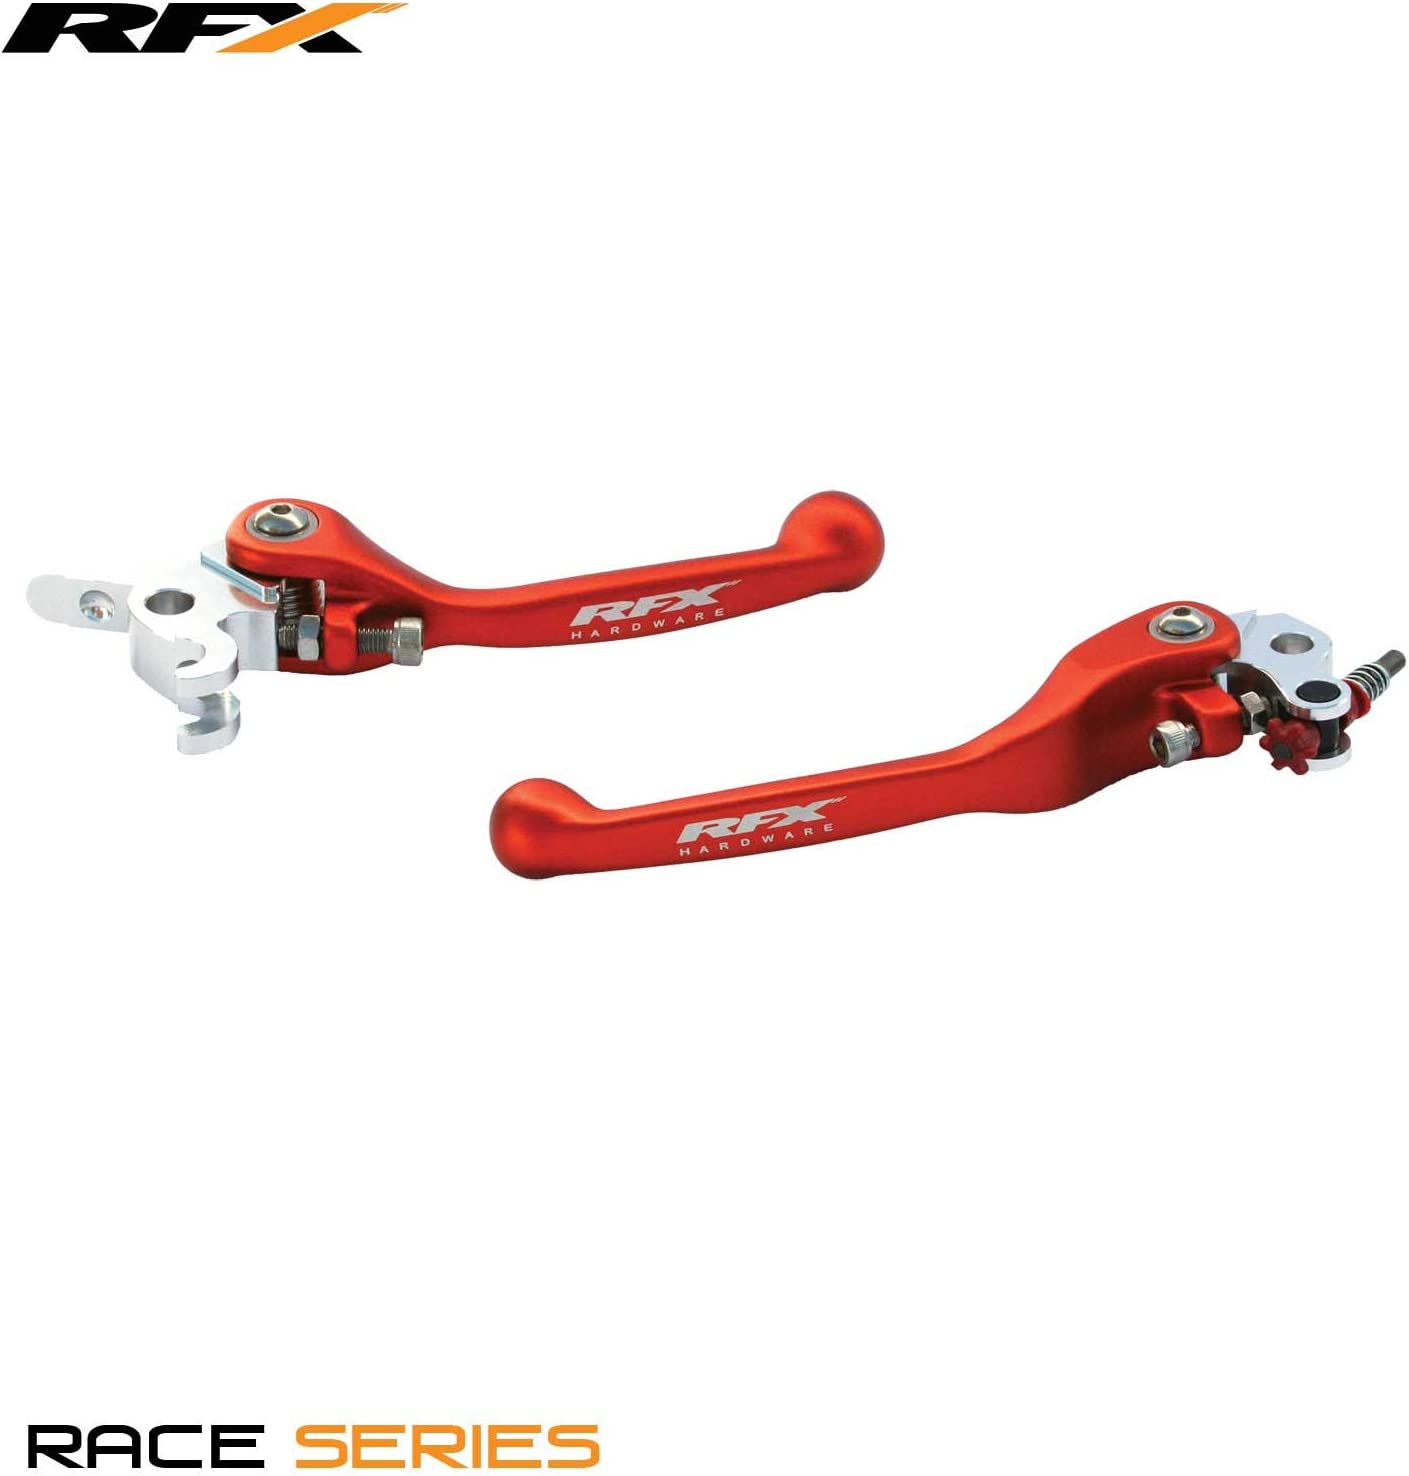 /08 Rfx Fxfl 50300/55OR forgiata flessibile leva set KTM SX125/EXC125/05/ /08//144//200//200/05/